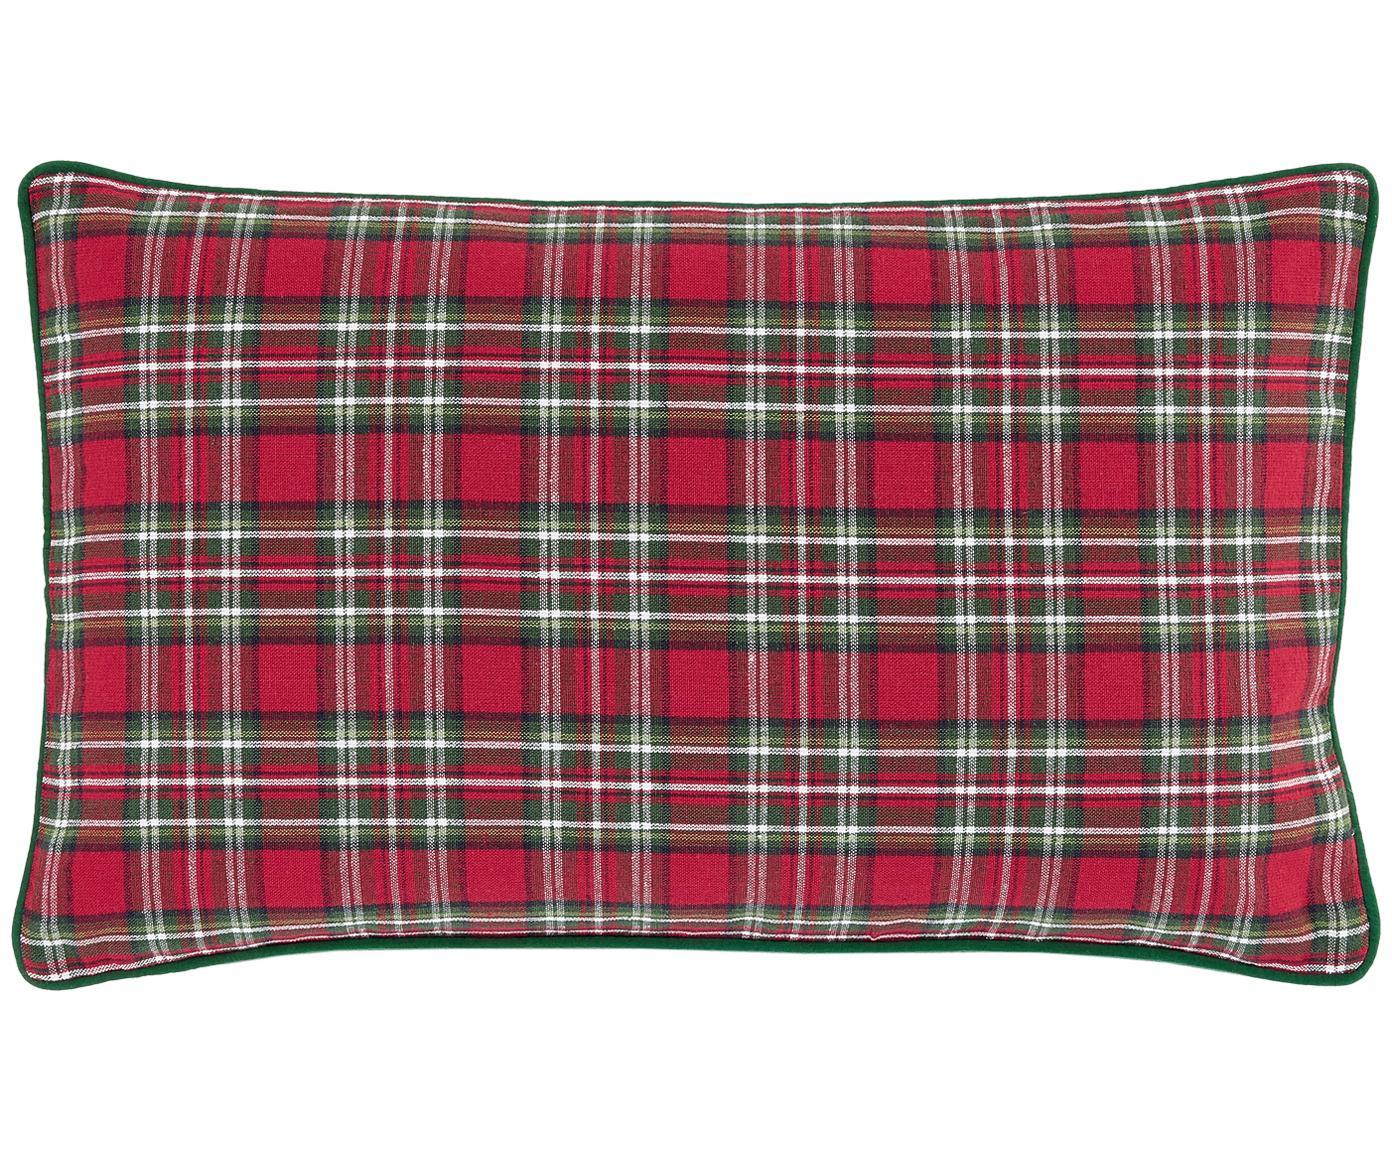 Federa arredo motivo scozzese Tartan, Cotone, Rosso, verde scuro, Larg. 30 x Lung. 50 cm